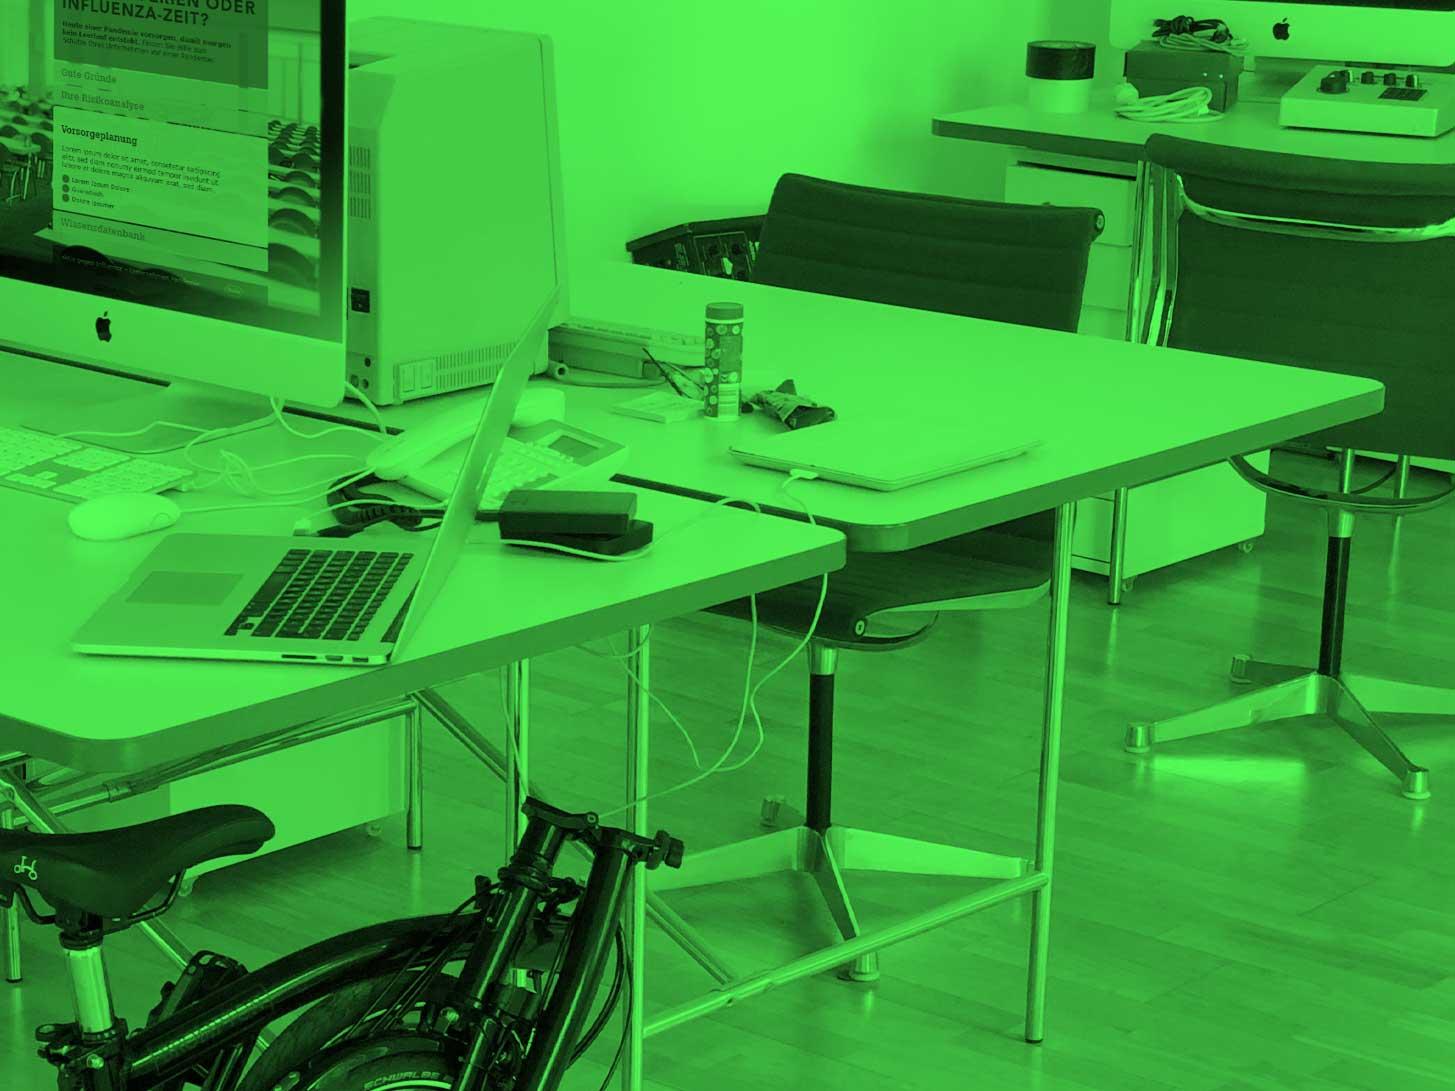 Mood Photo Office LOBO Design: Brompton, iMac, Macbook, Eames chairs, Eiermann tables, Moog Synthesizer, Seifenblasen